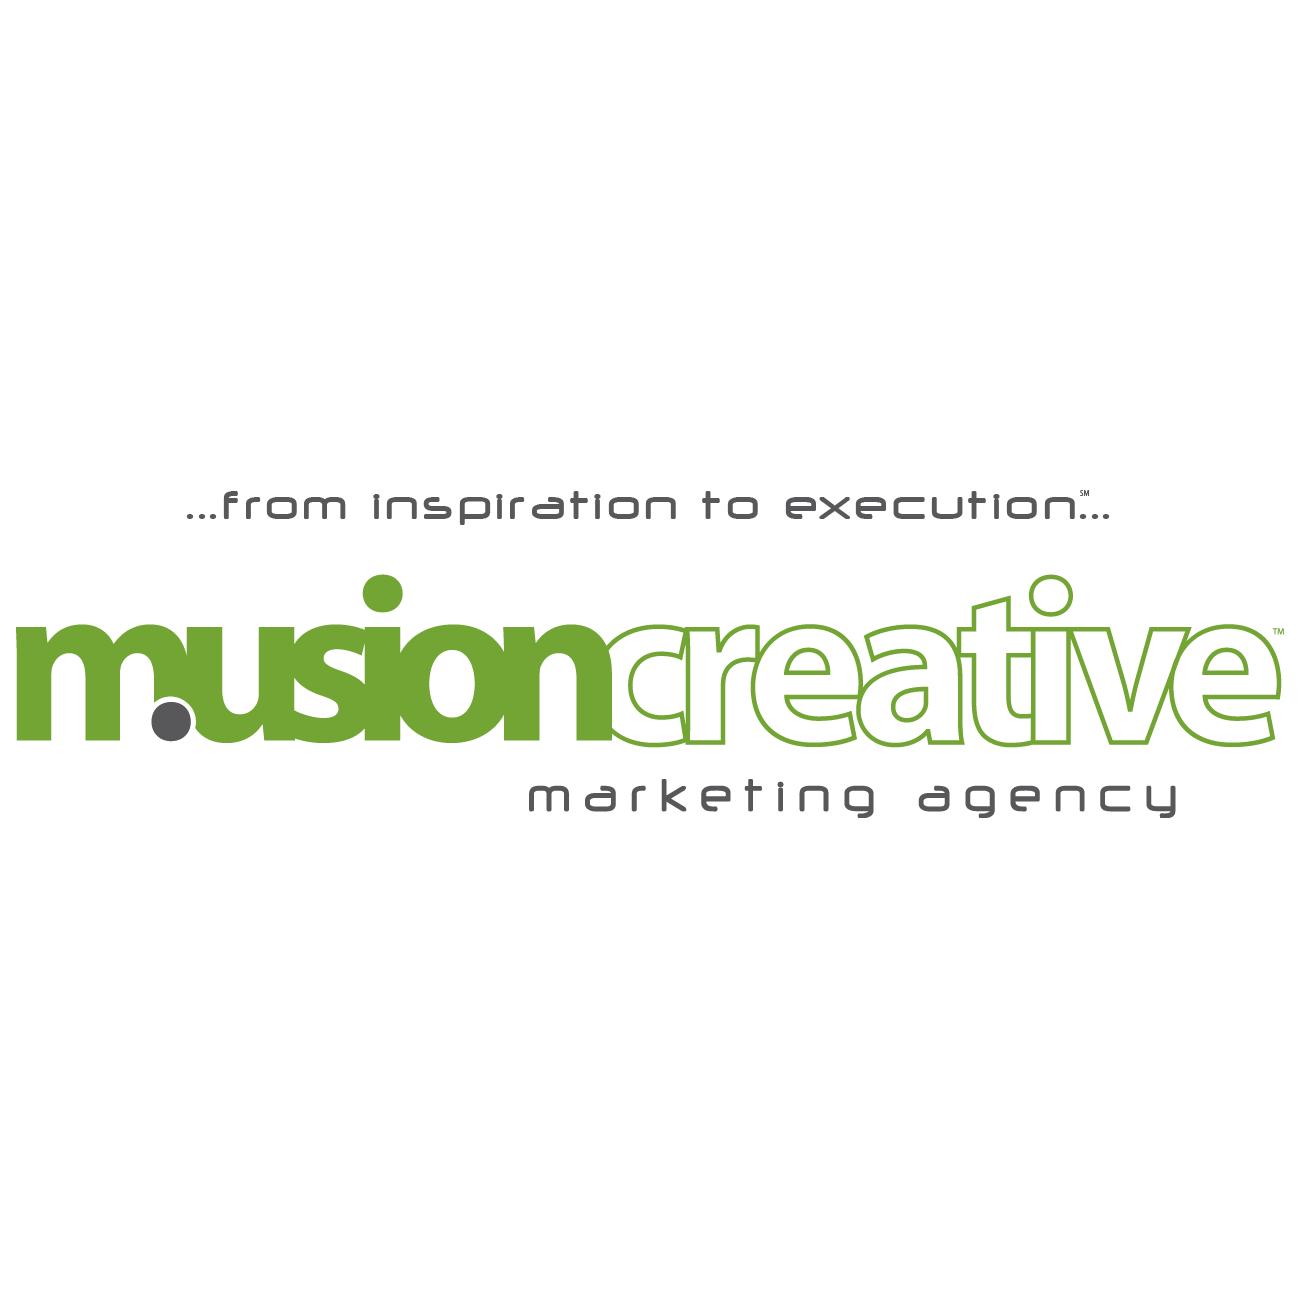 Musion Creative Marketing Agency image 1